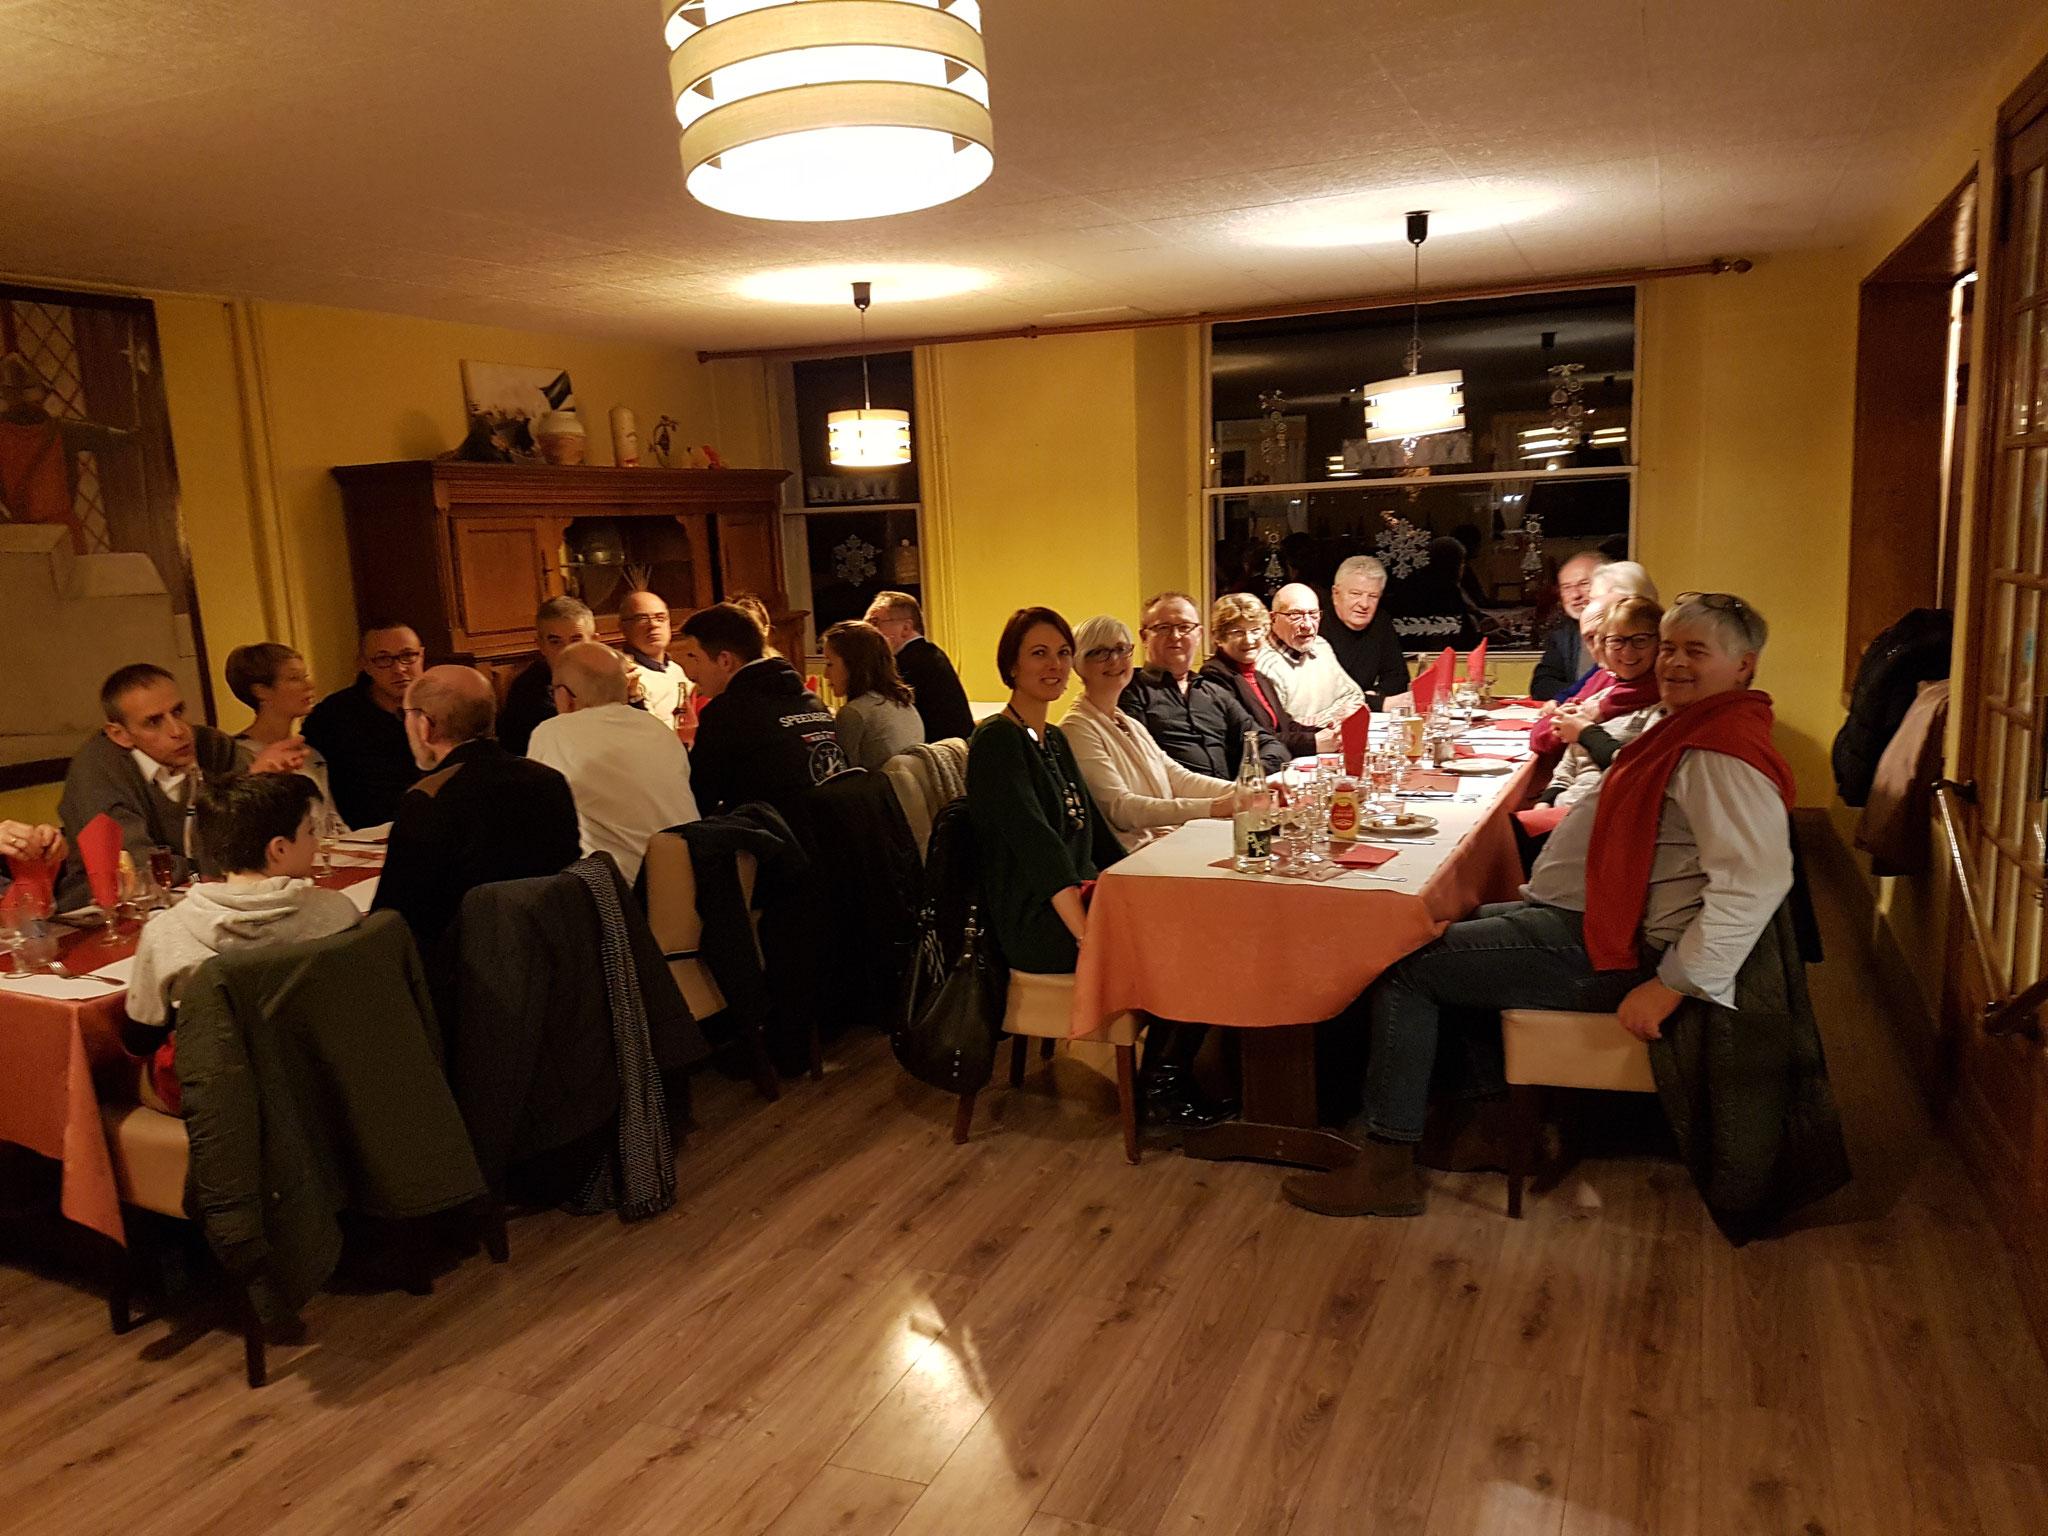 Aéro-Club de Sens - Galette 2019 - Membres - Dîner 1